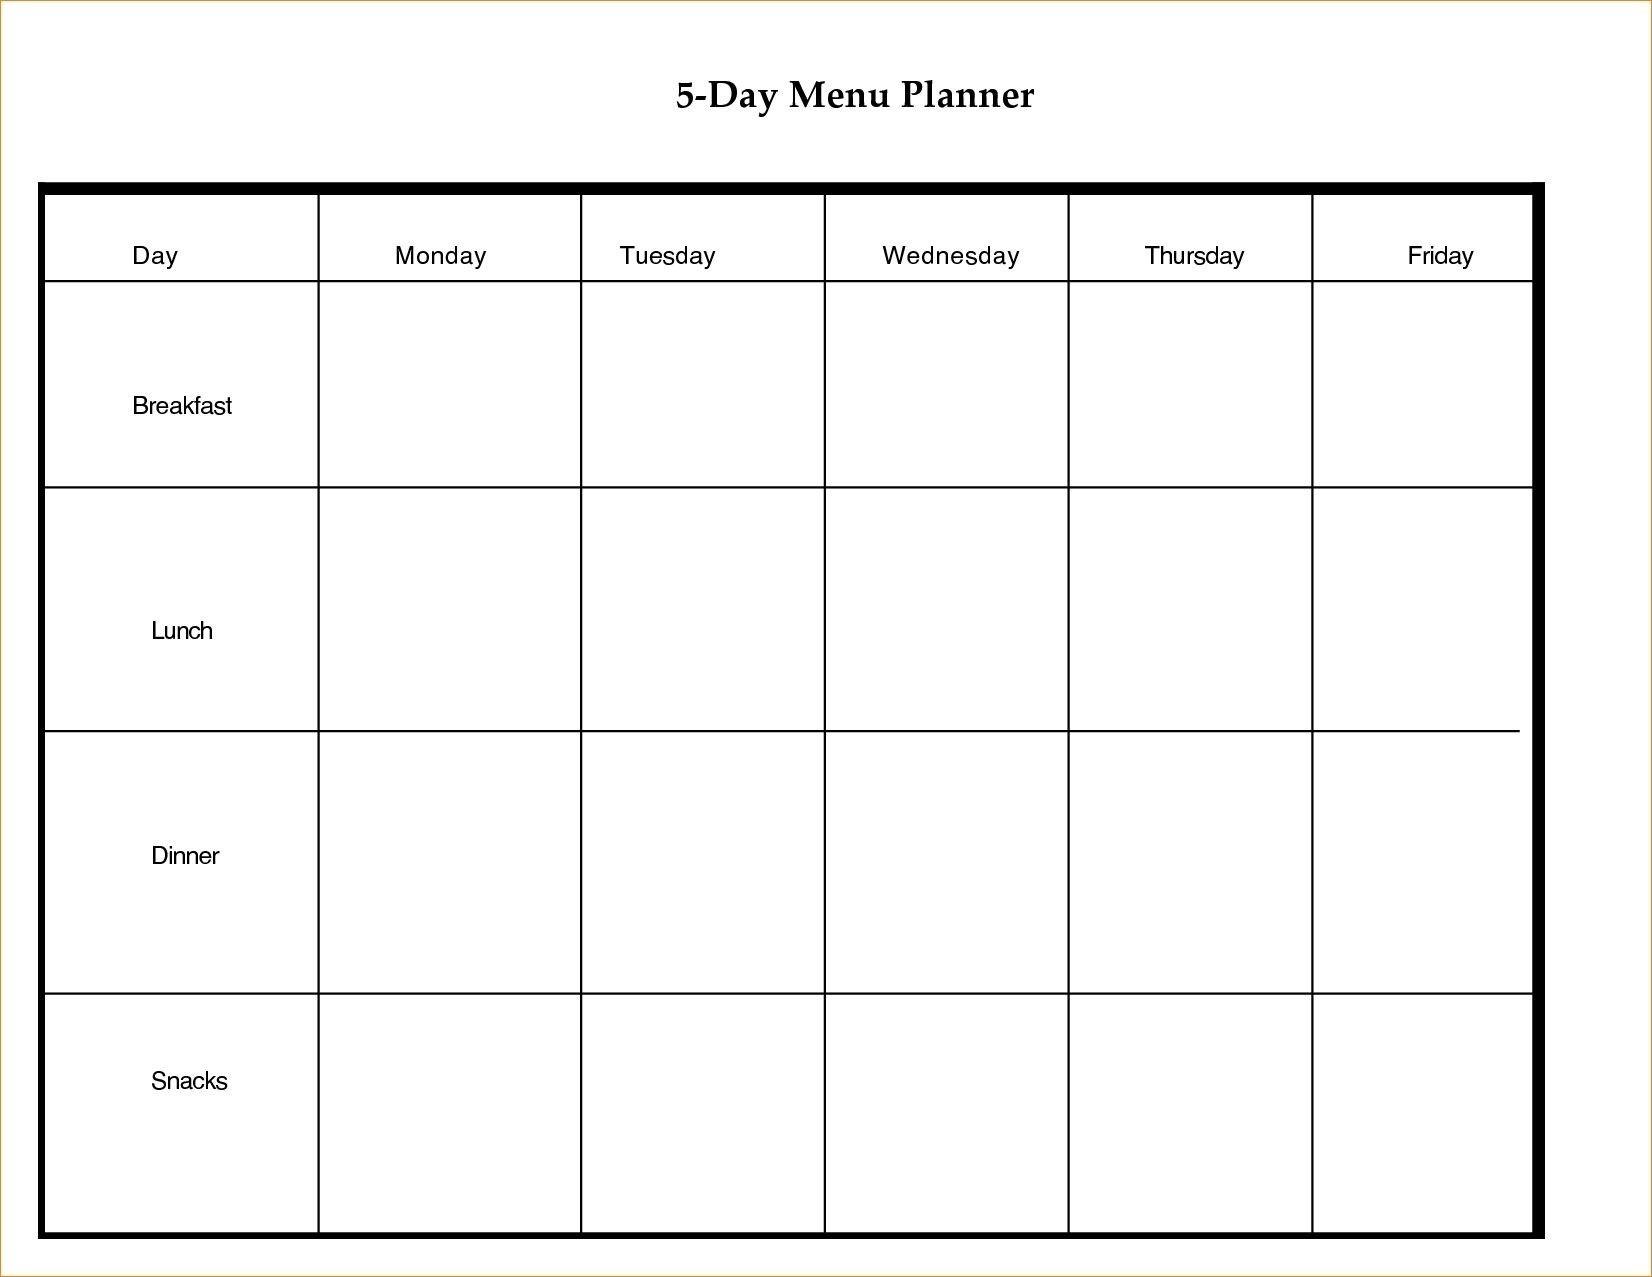 Blank 5 Day Week Calendar | Blank Calendar Template Dowload-5 Day Blank Calendar